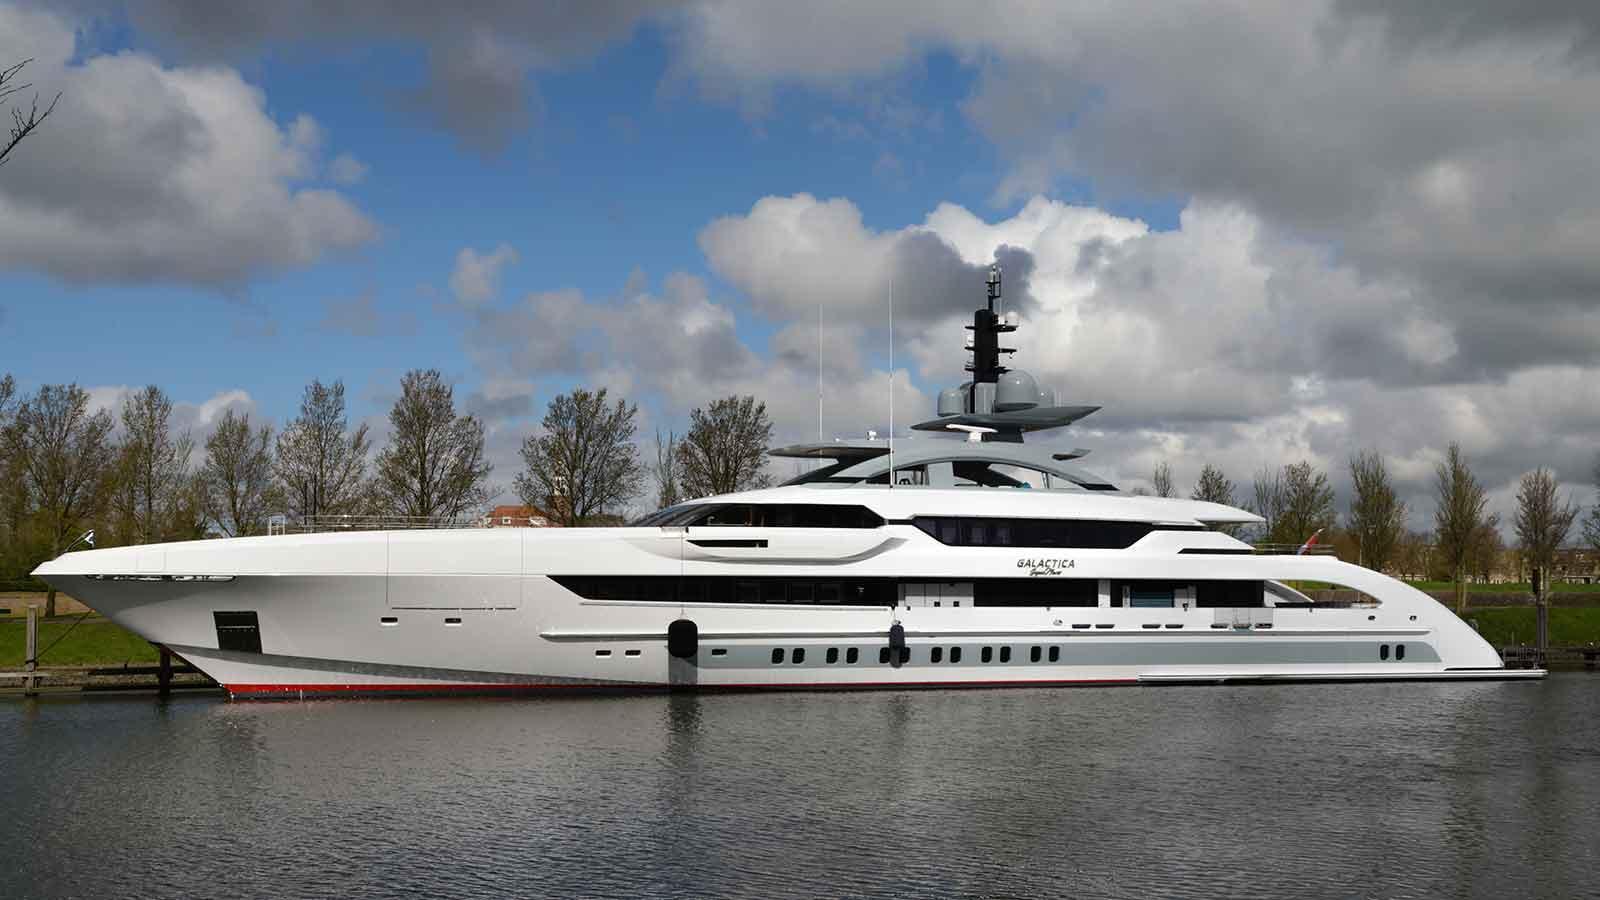 galactica-super-nova-motoryacht-heesen-yachts-2016-70m-profile-moored